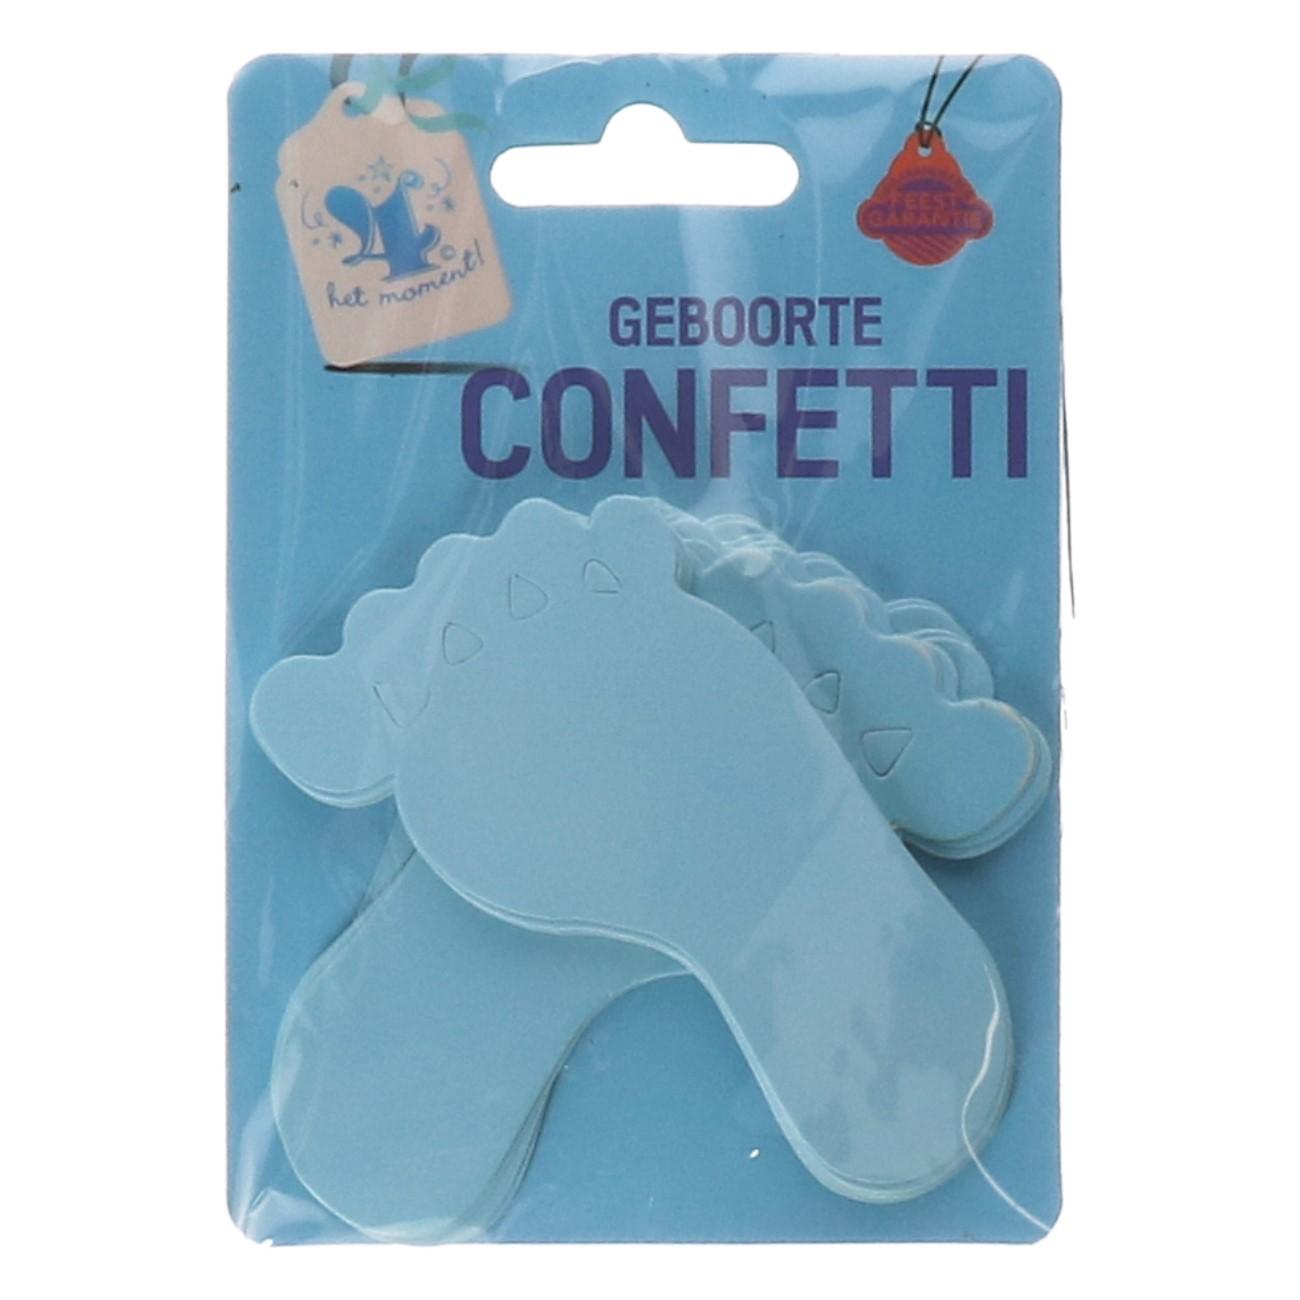 Geboorte confetti voetjes blauw